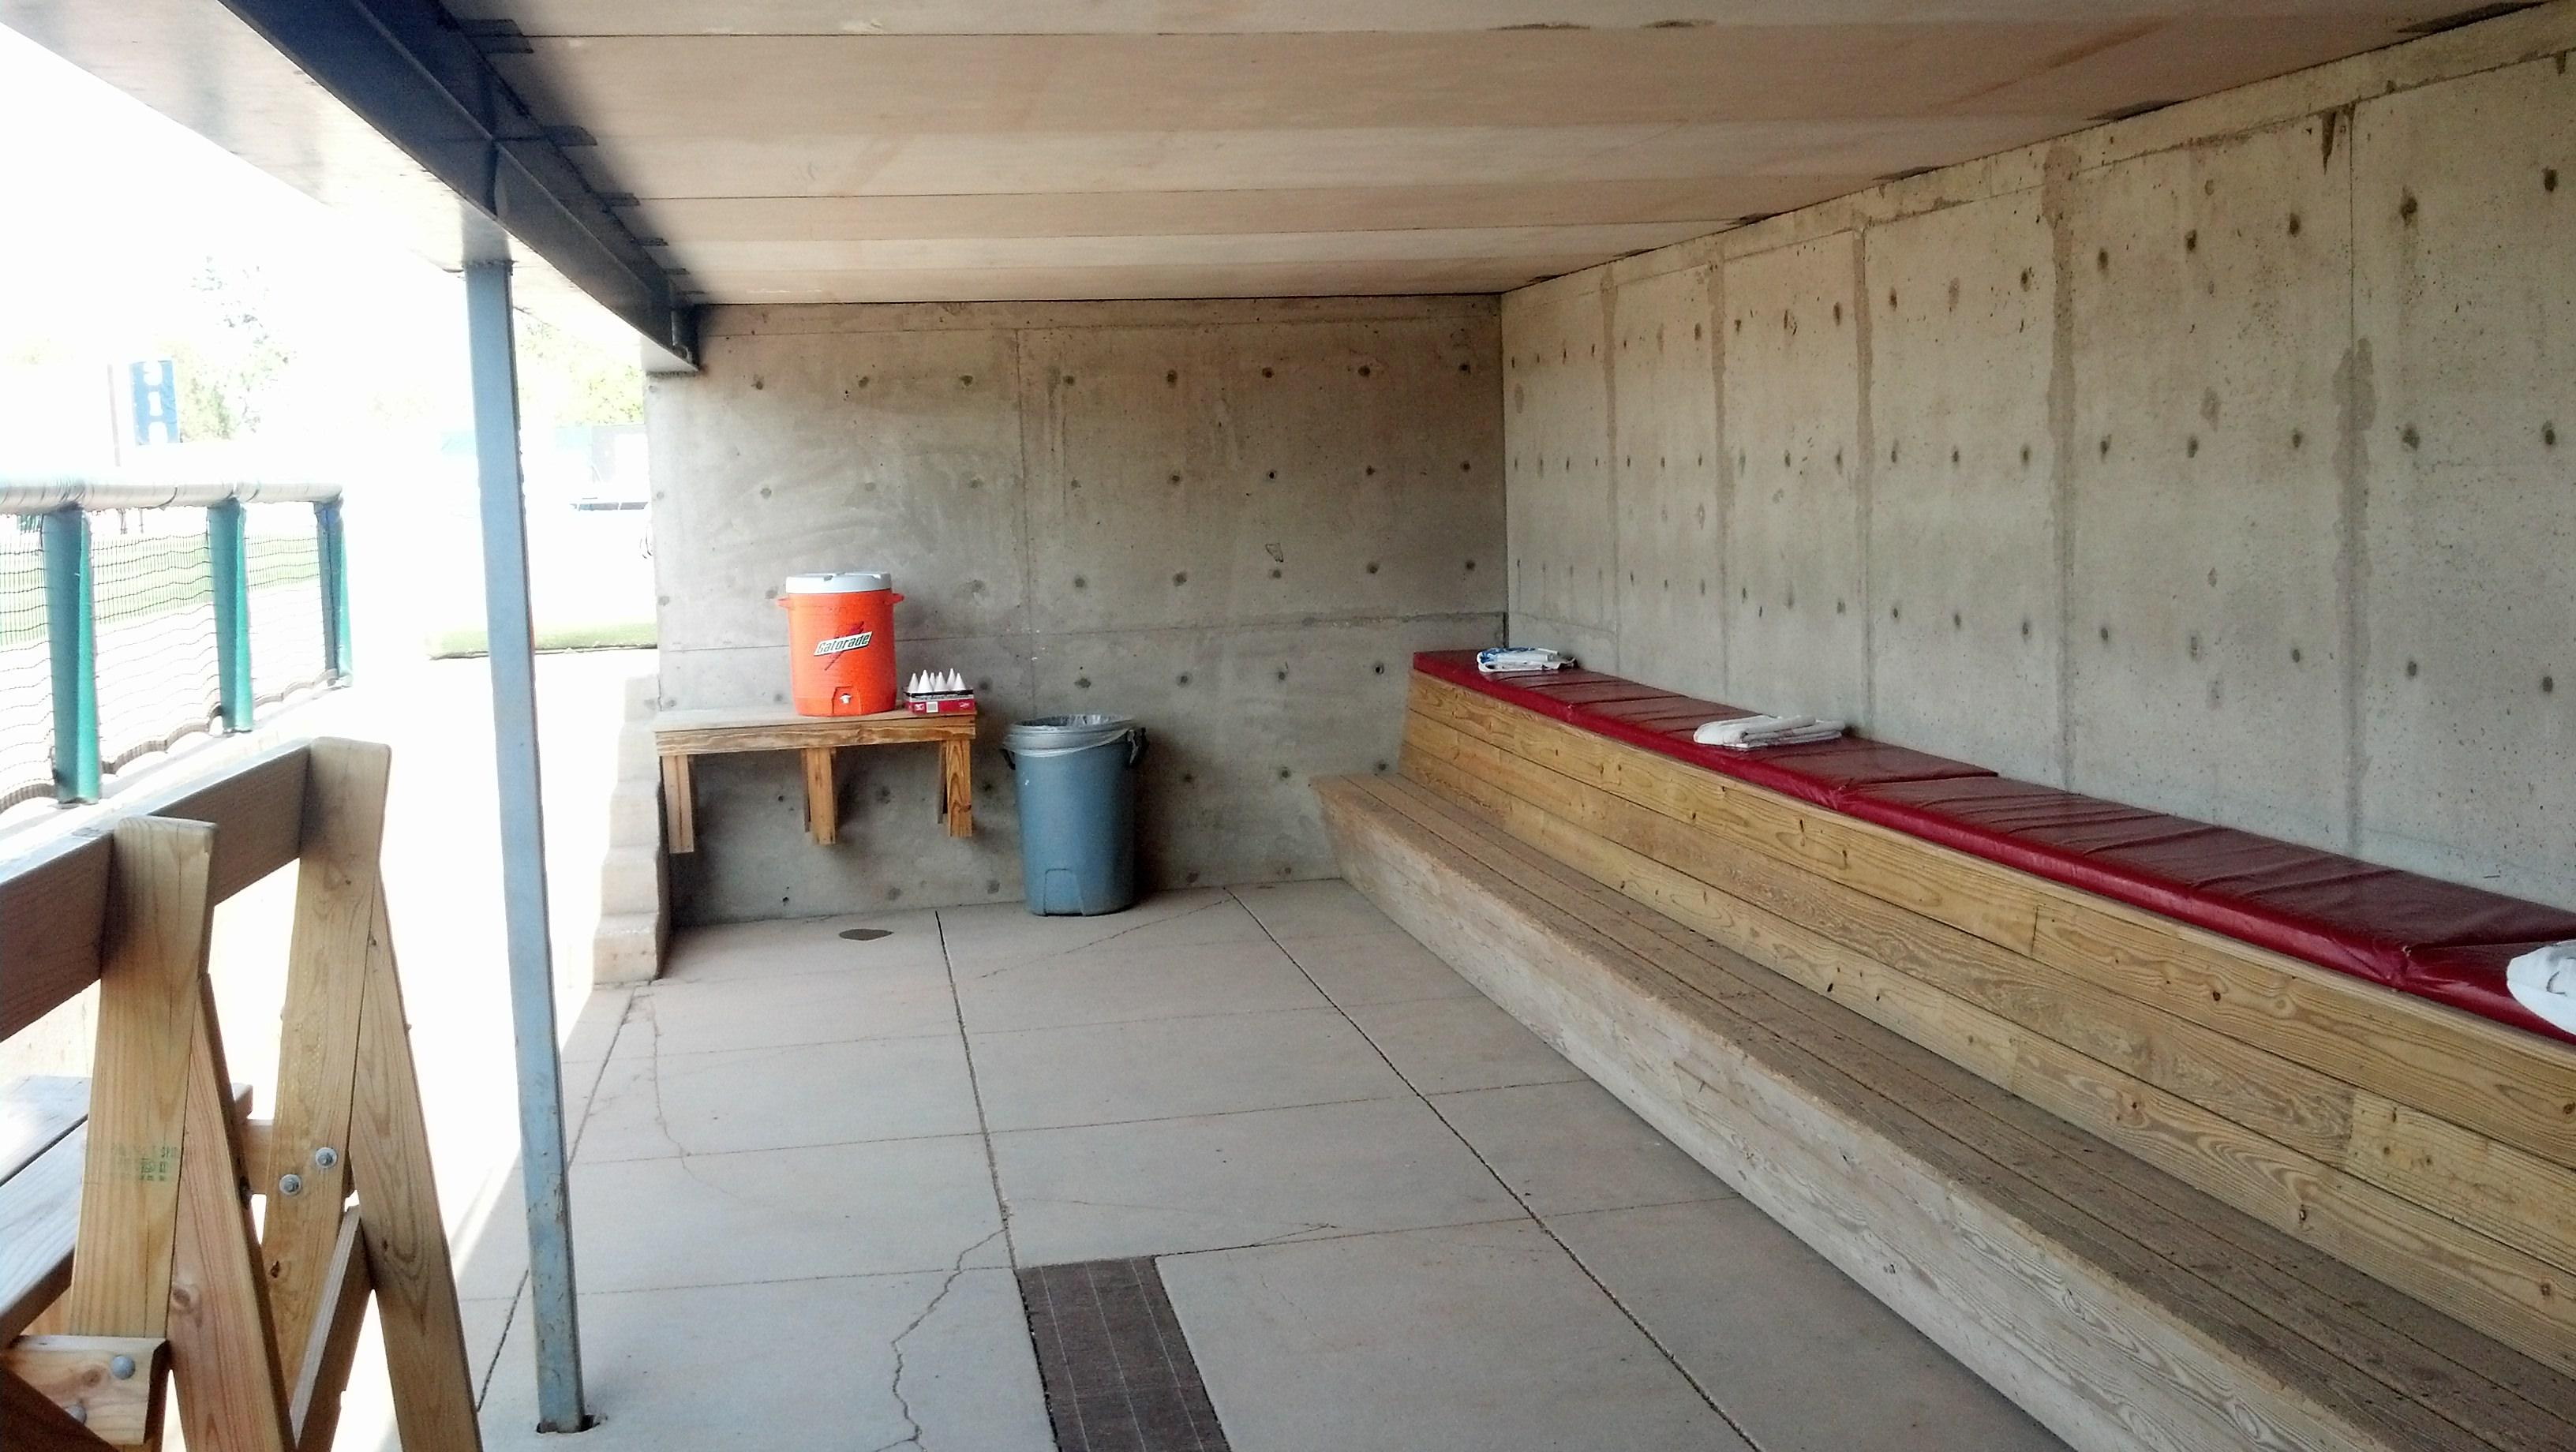 Baseball Dugout Bedroom Designs: Blustery Baseball In Burlington « Holding Down The Fort